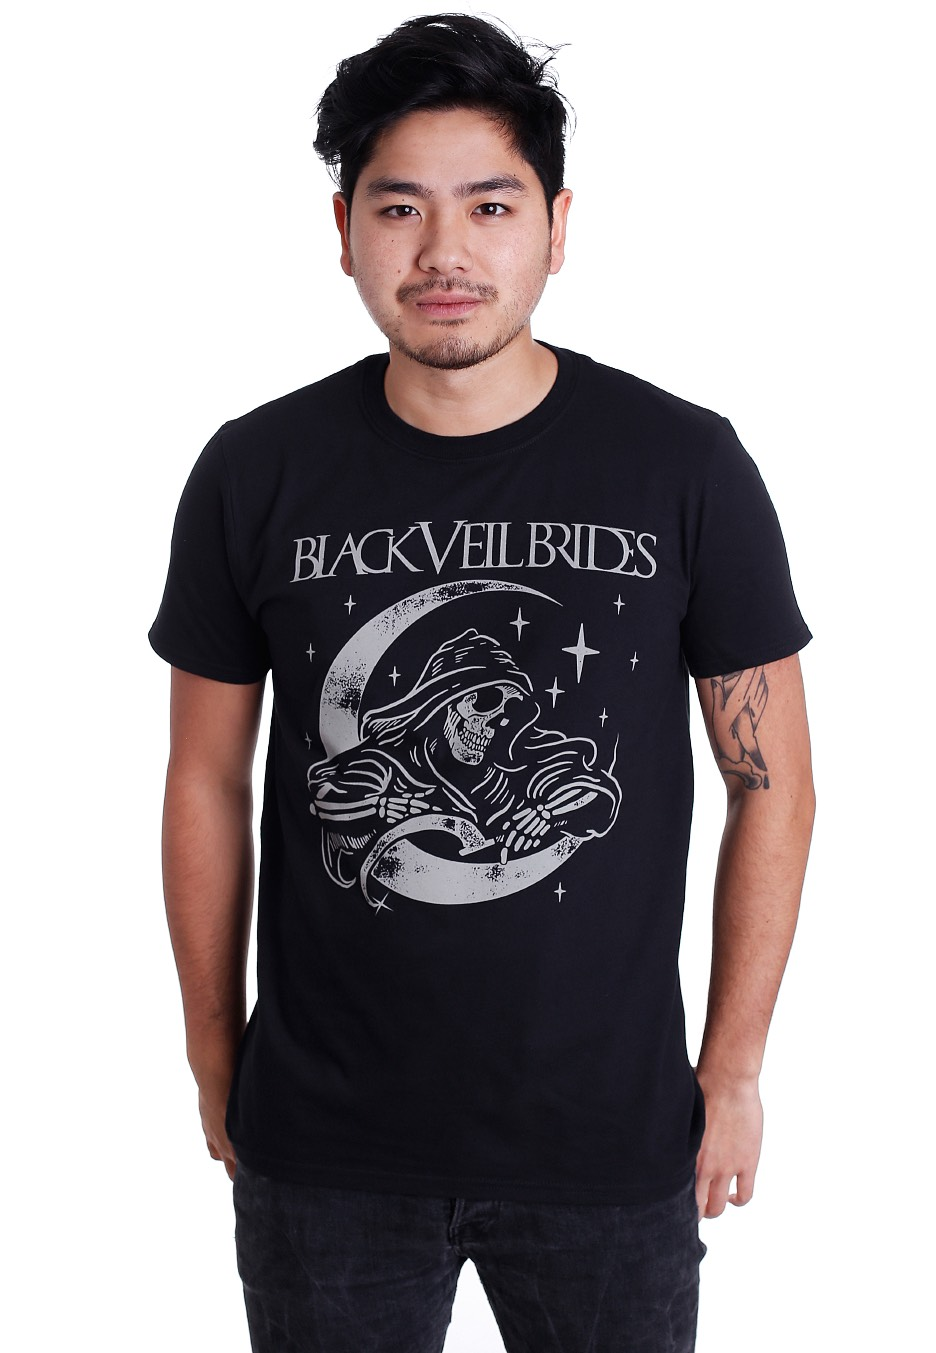 5f53185e73f Black Veil Brides - Moon Reaper - T-Shirt - Official Alternative Rock  Merchandise Shop - Impericon.com Worldwide